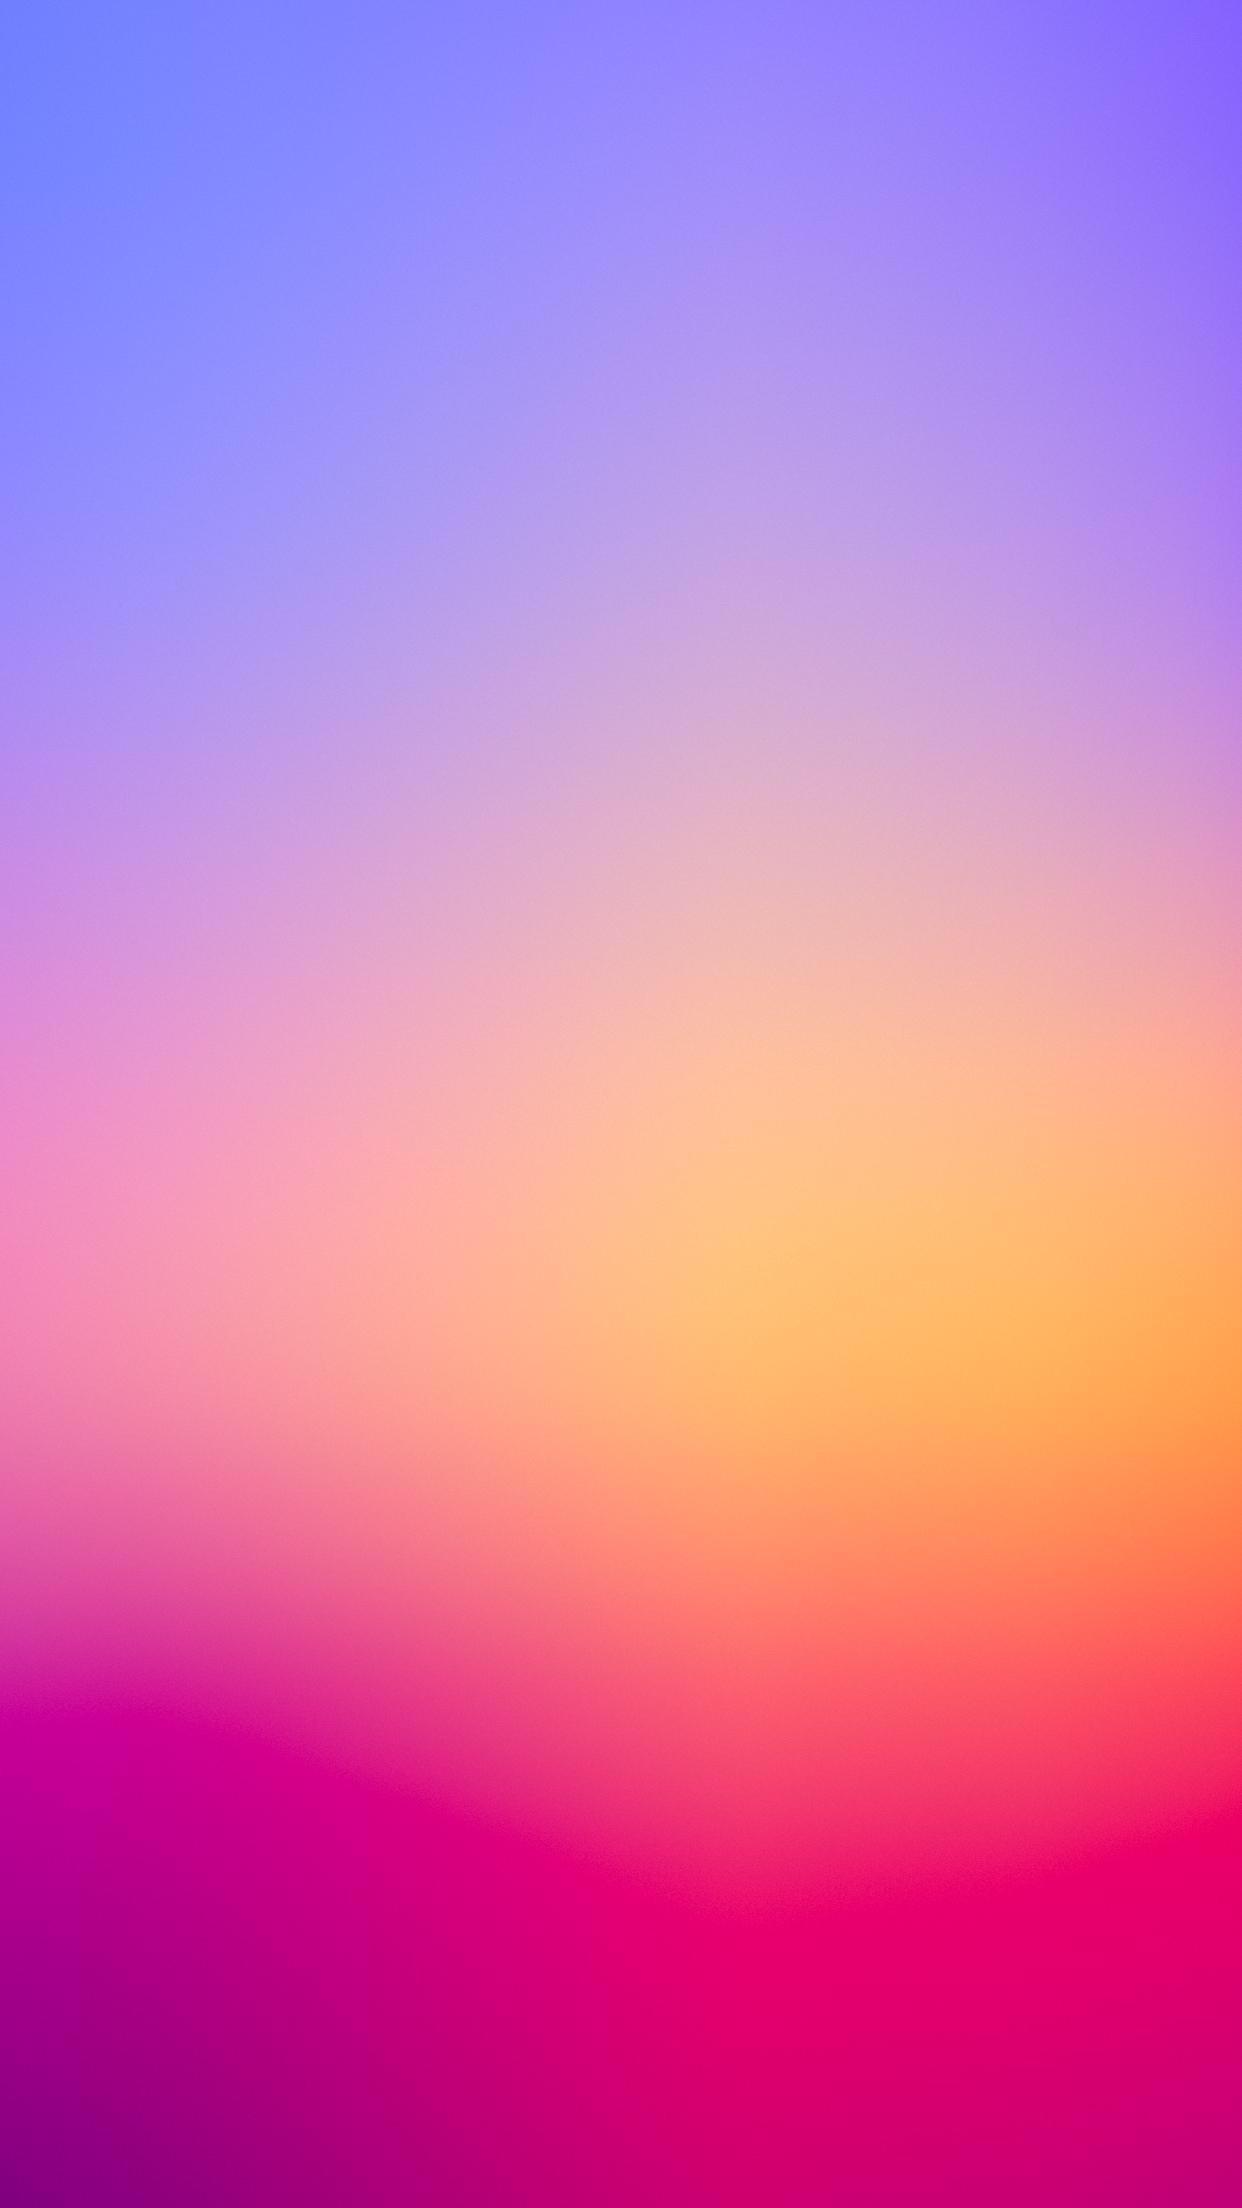 General 1242x2208 blurred colorful vertical portrait display